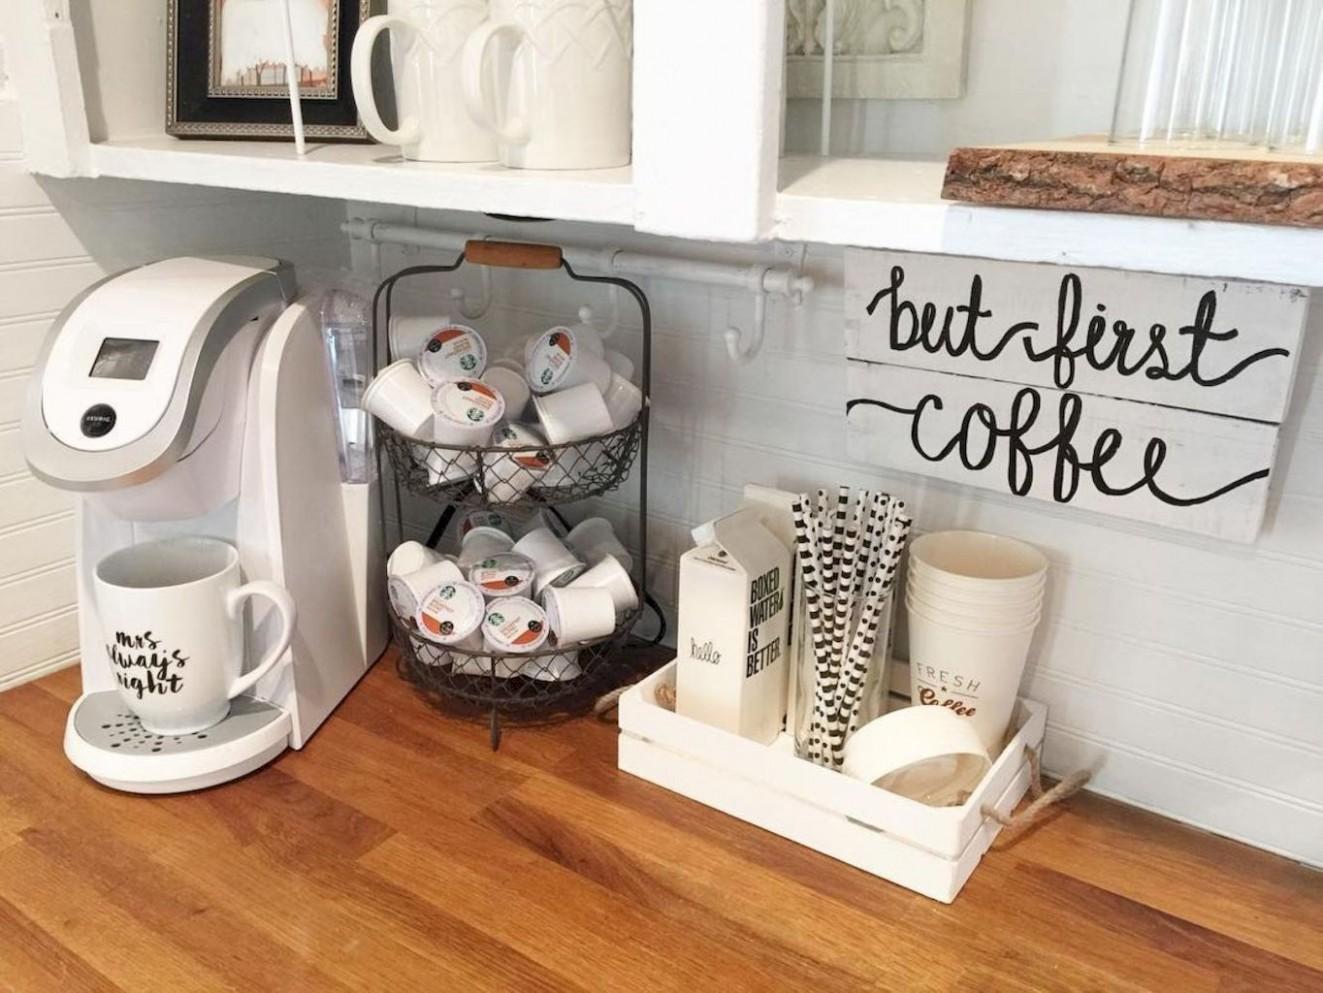 Cute diy collage apartment decor ideas on a budget (10)  Diy  - Apartment Kitchen Decorating Ideas On A Budget